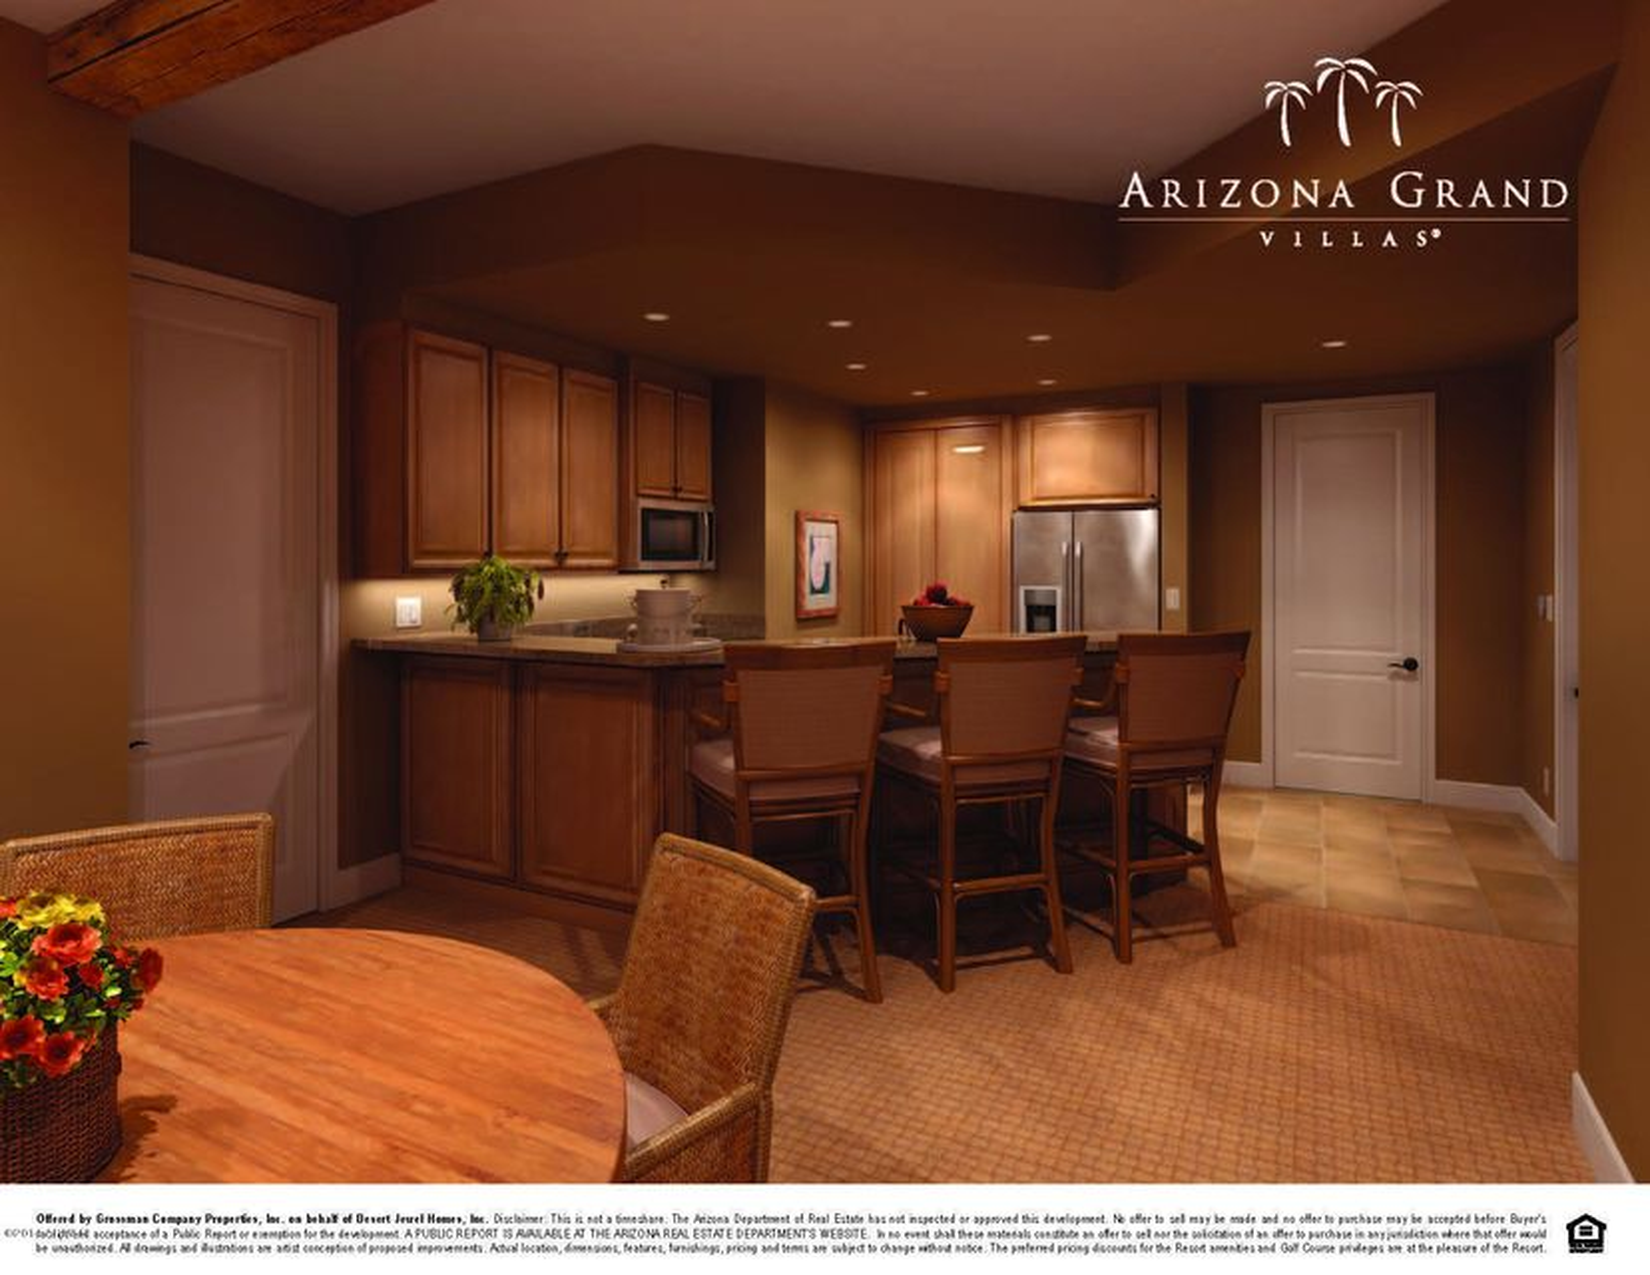 MLS 5385508 8000 S ARIZONA GRAND Parkway Unit 220, Phoenix, AZ Ahwatukee Community AZ Luxury